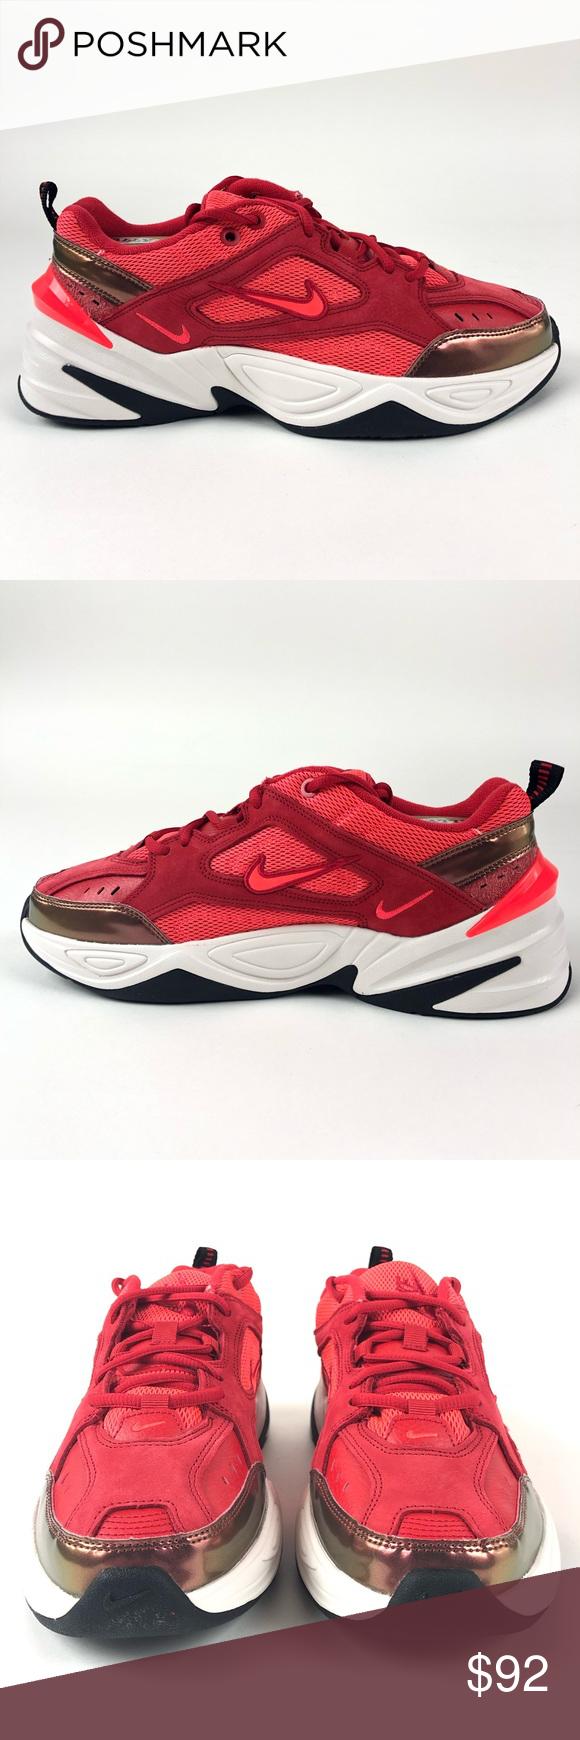 Nike M2k Tekno Bright Crimson Shoes Av7030 600 Nike Fashion Size 10 Shoes Clothes Design